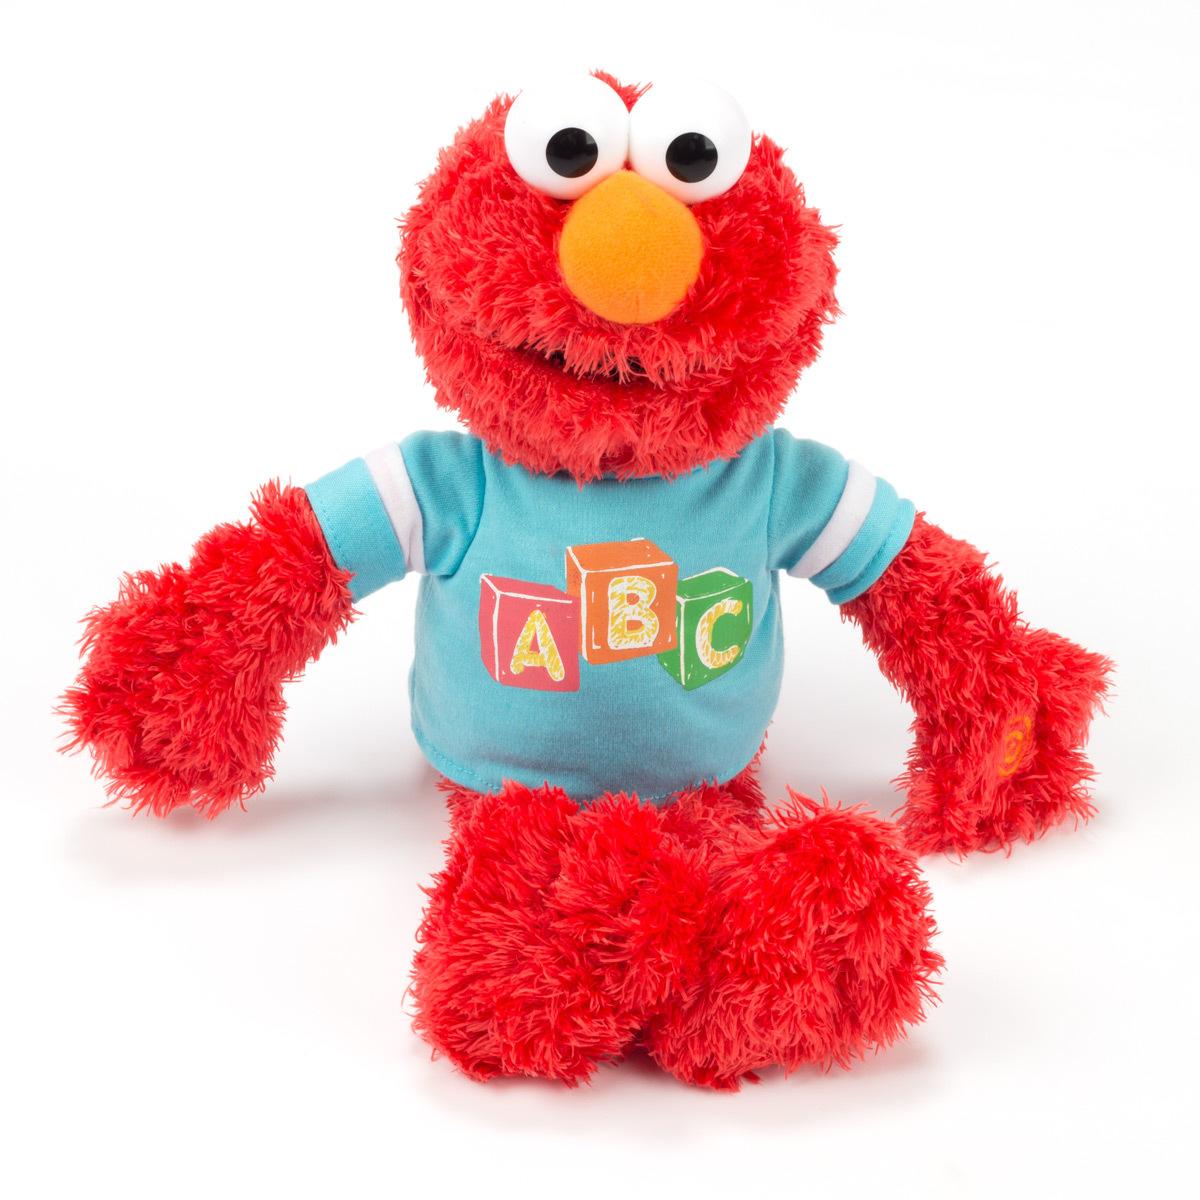 Sesame Street - ABC Elmo